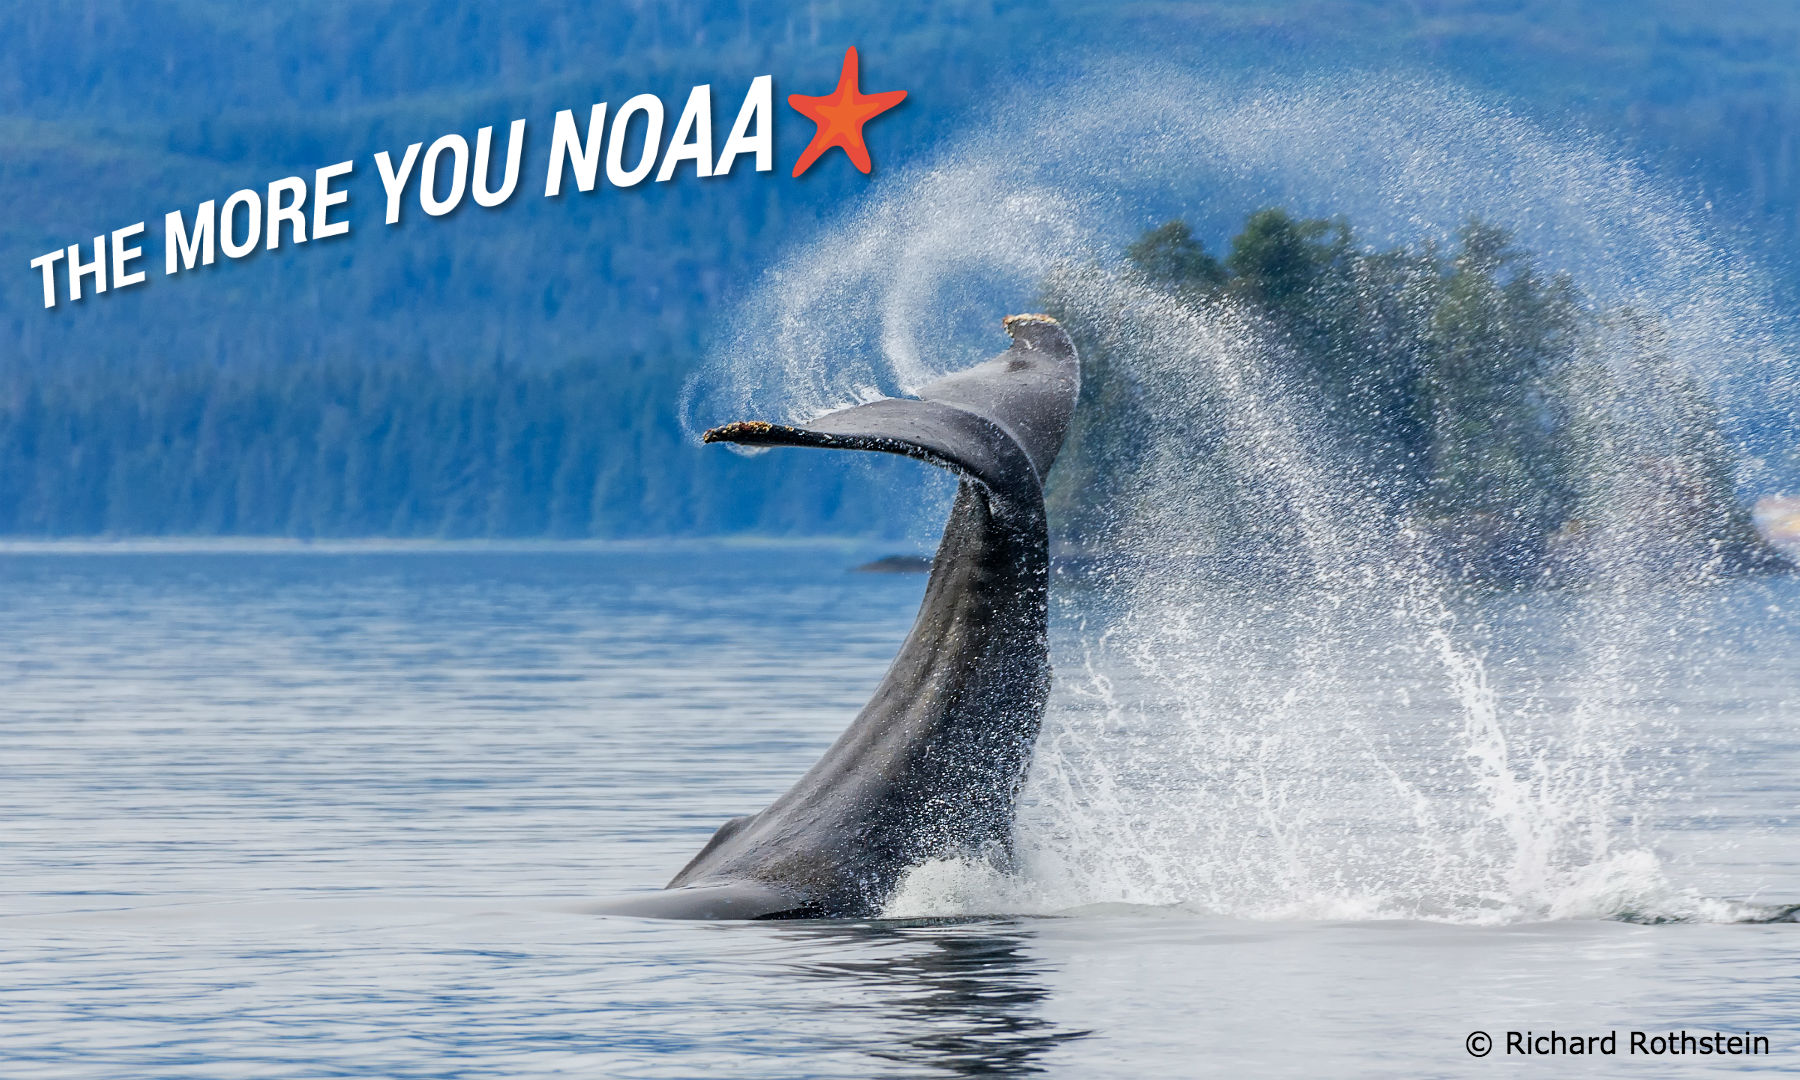 The More You NOAA - Ocean Conservancy